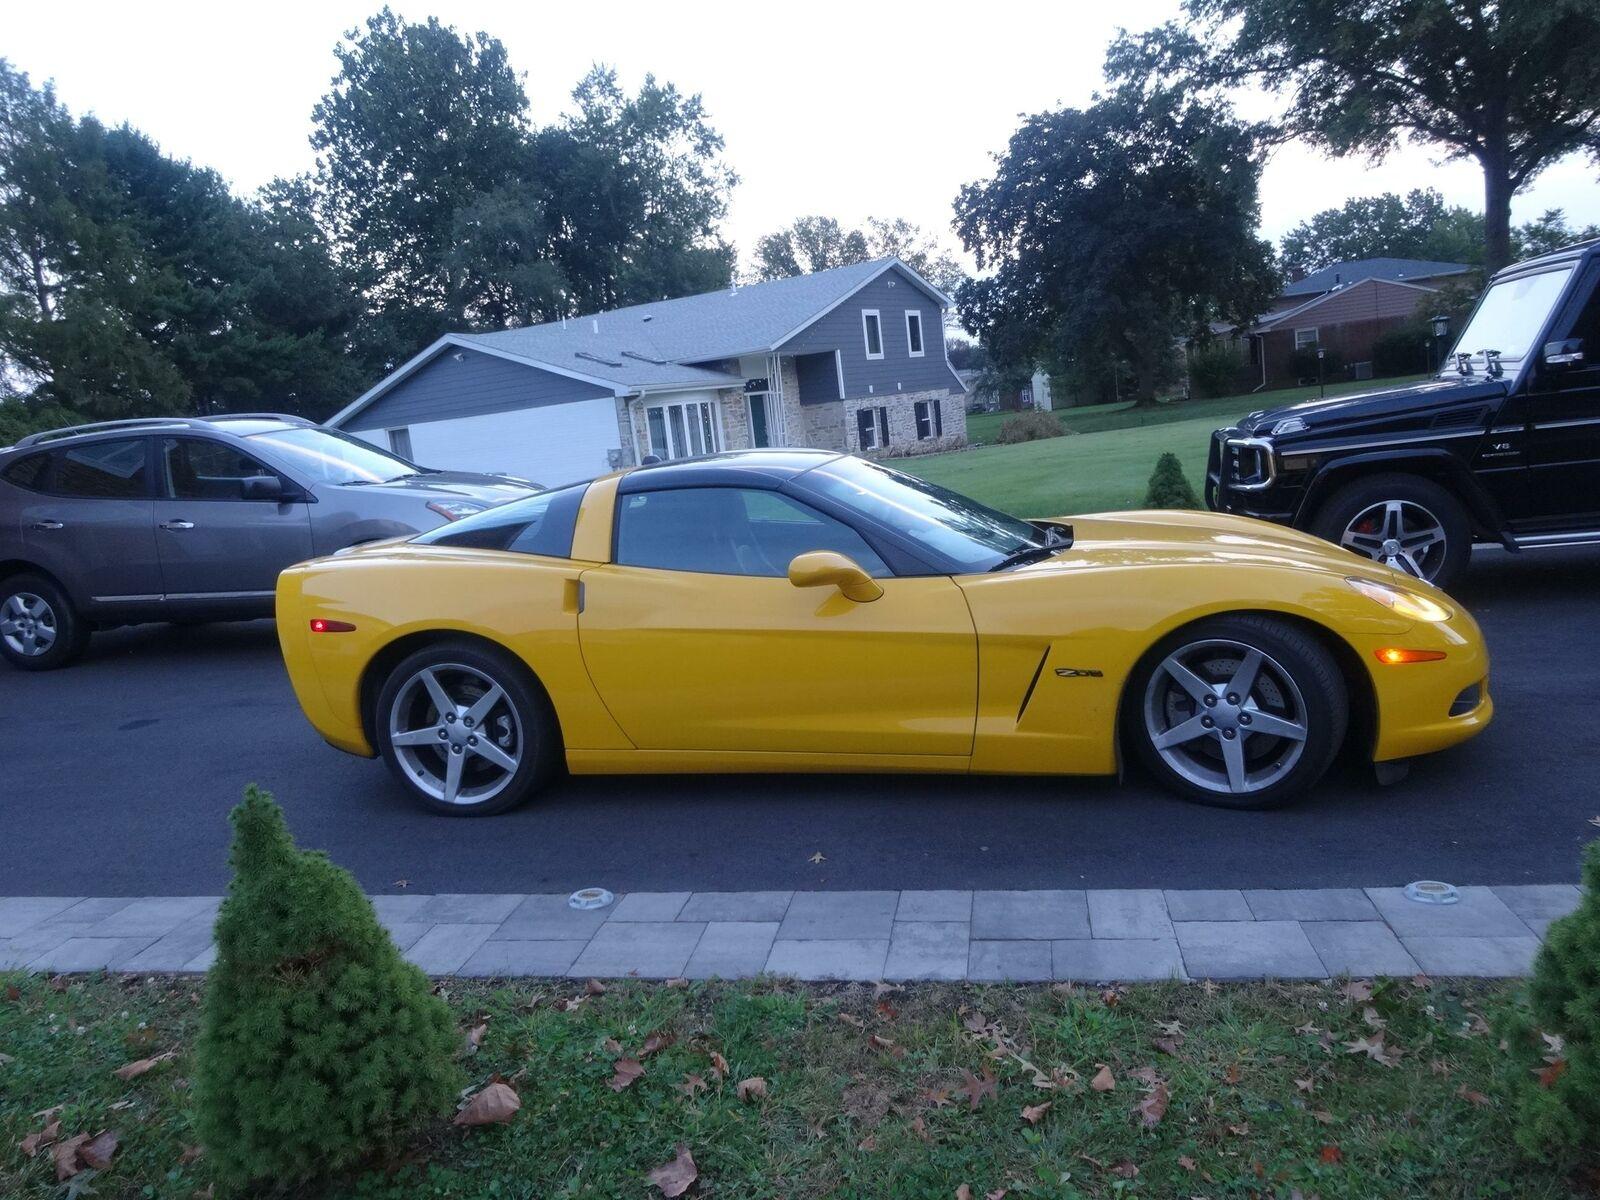 2005 Yellow Chevrolet Corvette     C6 Corvette Photo 10